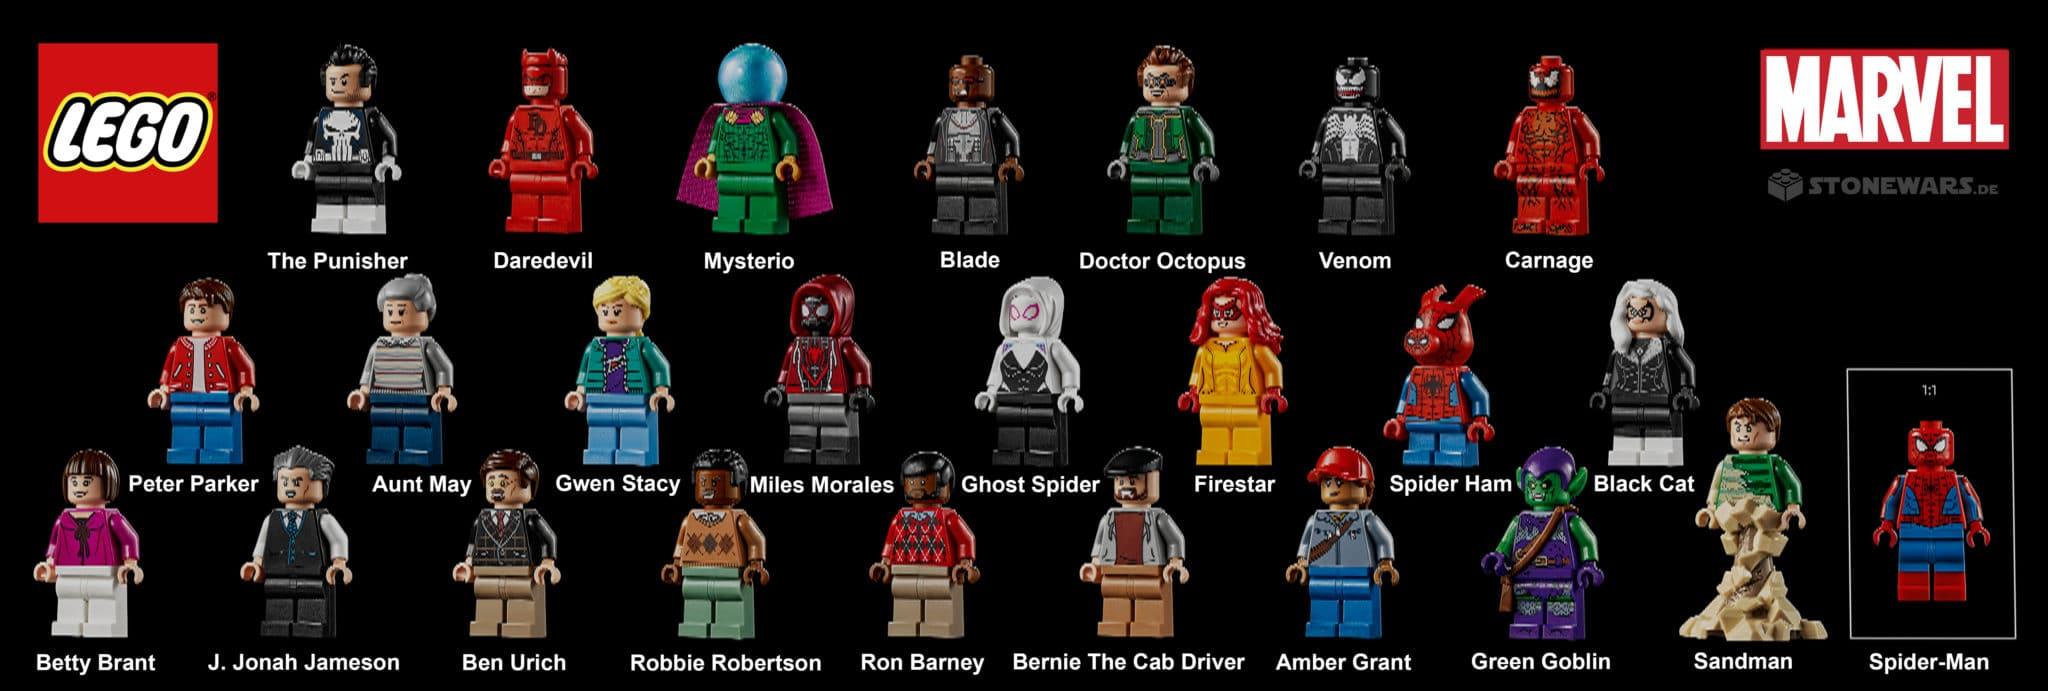 LEGO Daily Bugle 76178 Alle Minifiguren